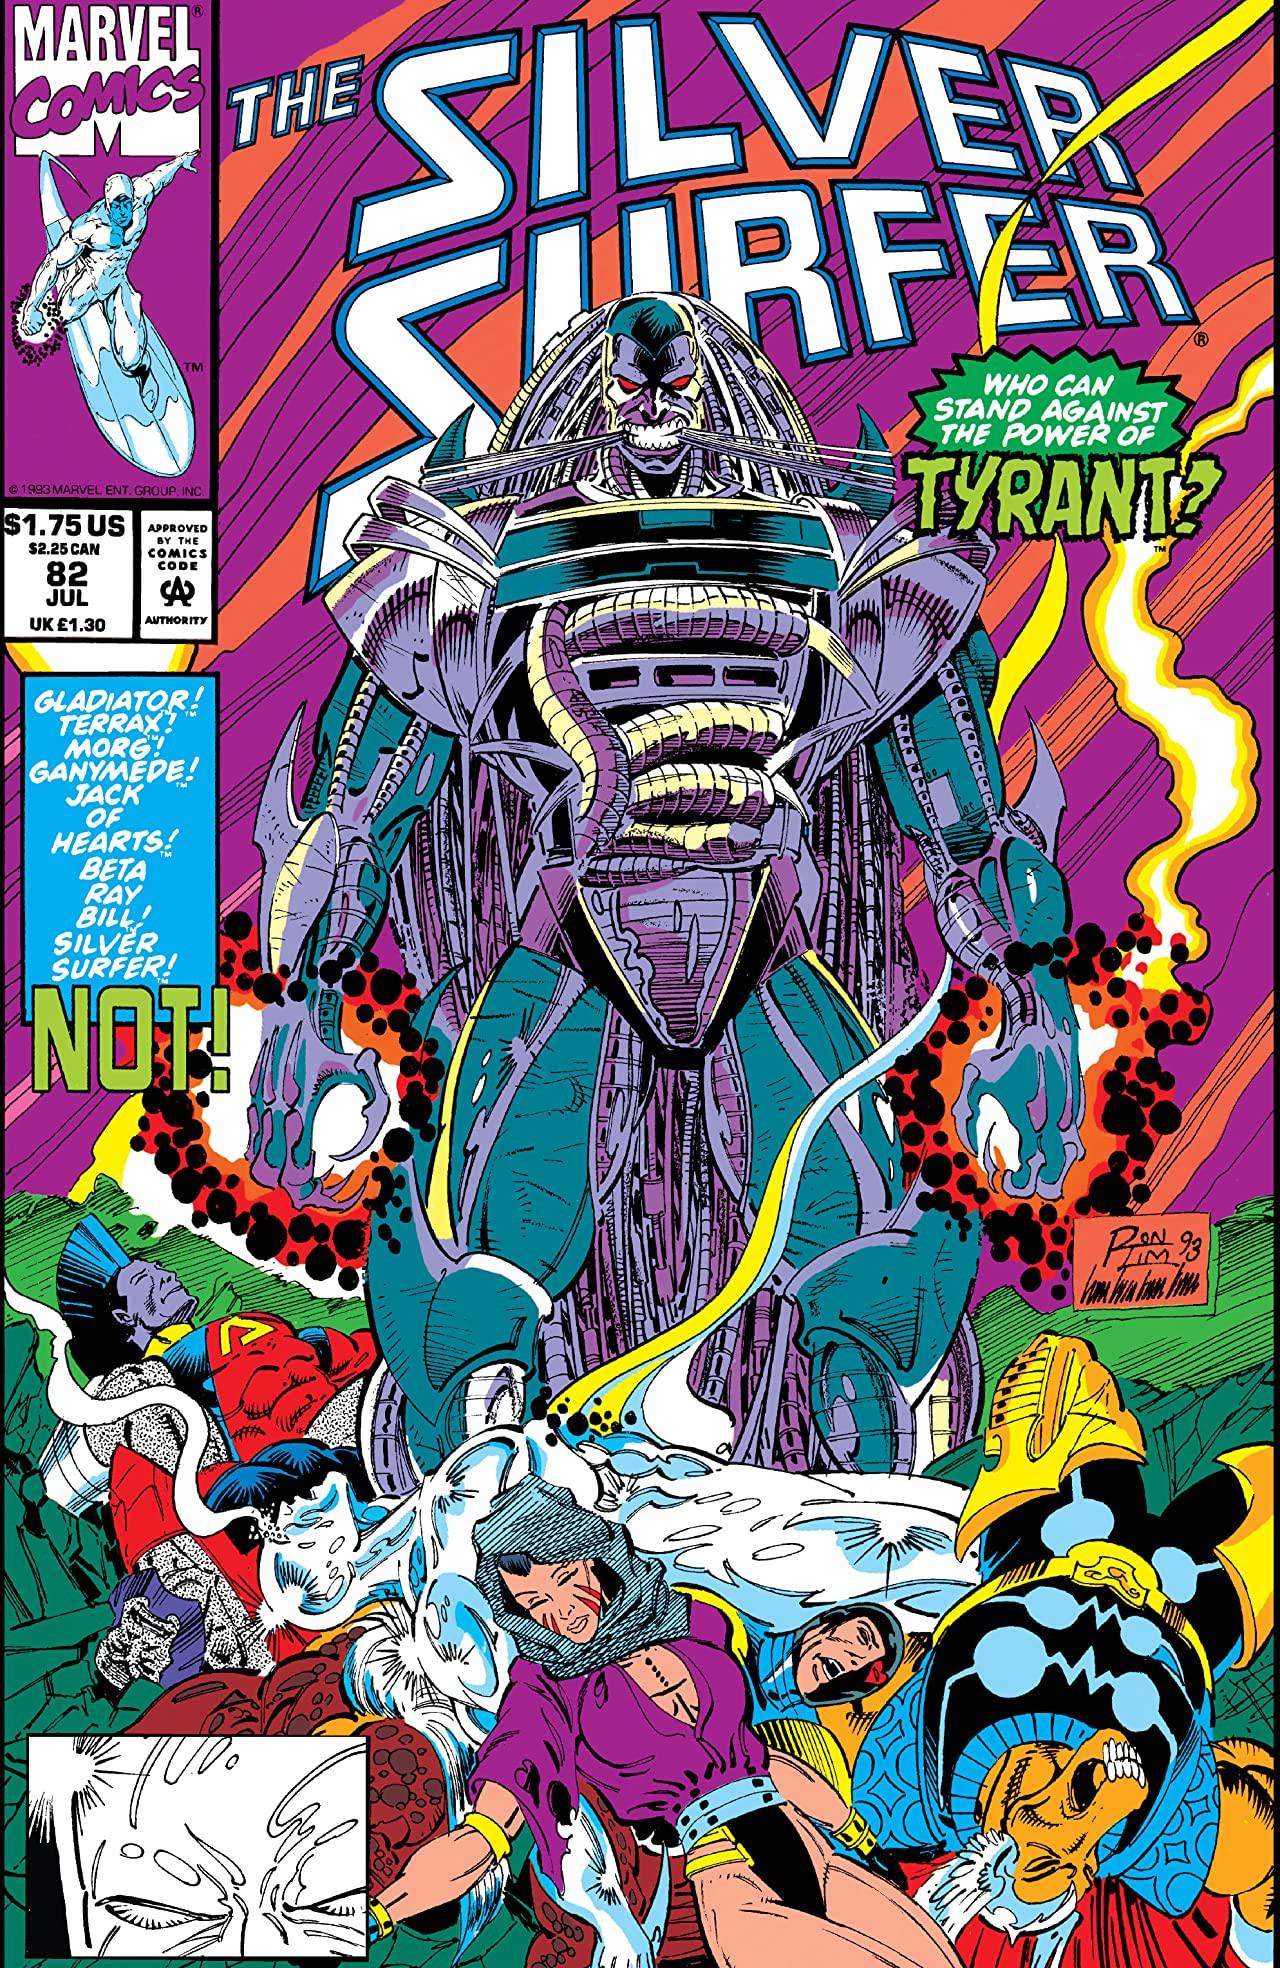 TALES OF SUSPENSE - 82, 1966, Iron Man, Captain America, Kirby, Colan, Marvel, F